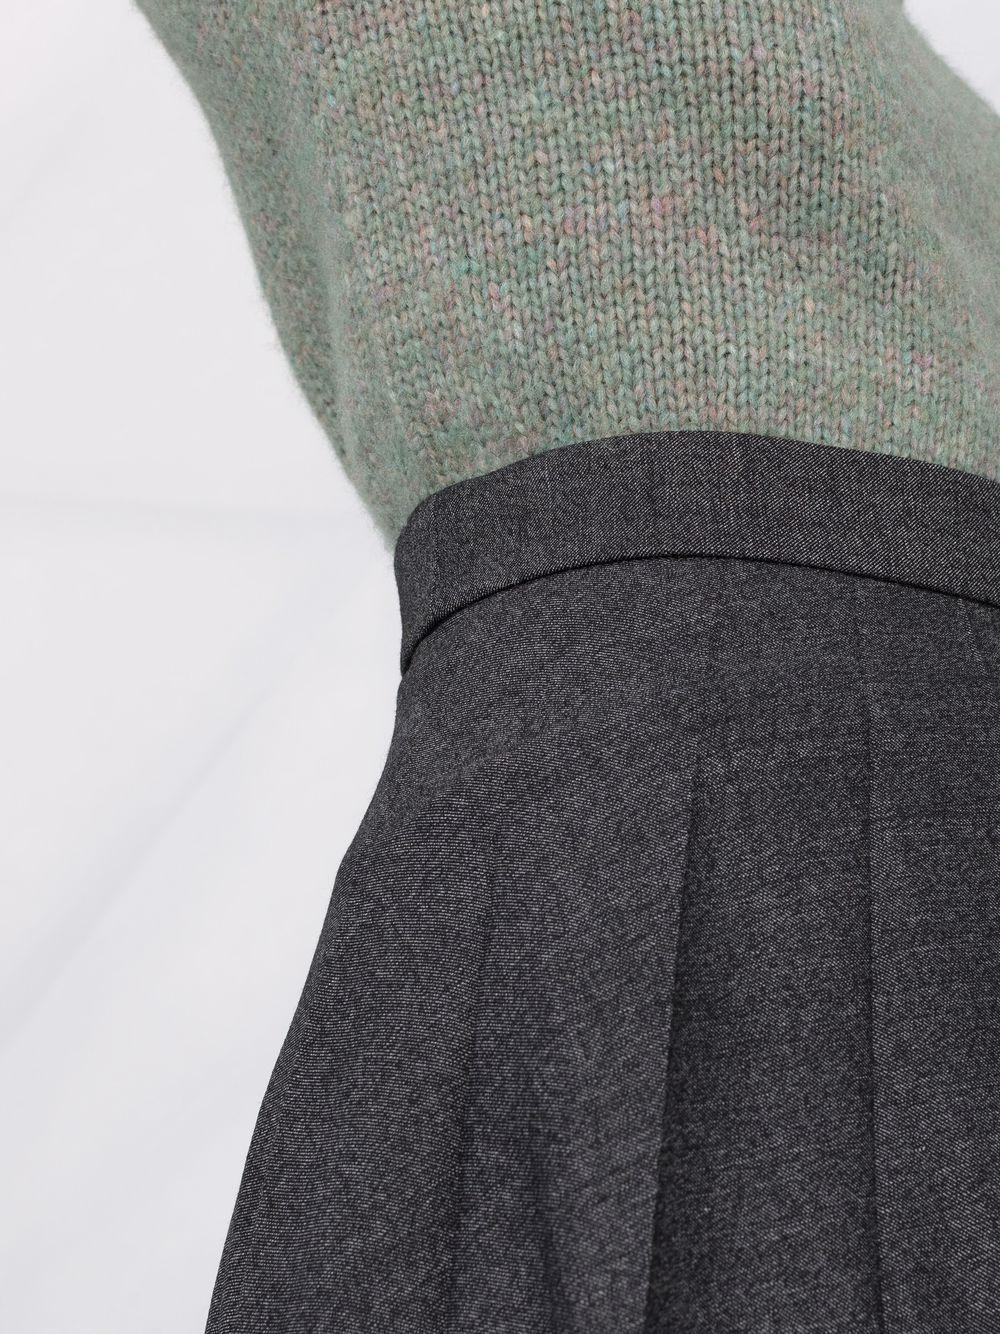 Maxi gonna plissettata in lana grigio scuro P.A.R.O.S.H.   Gonne   D620435-PLANE020